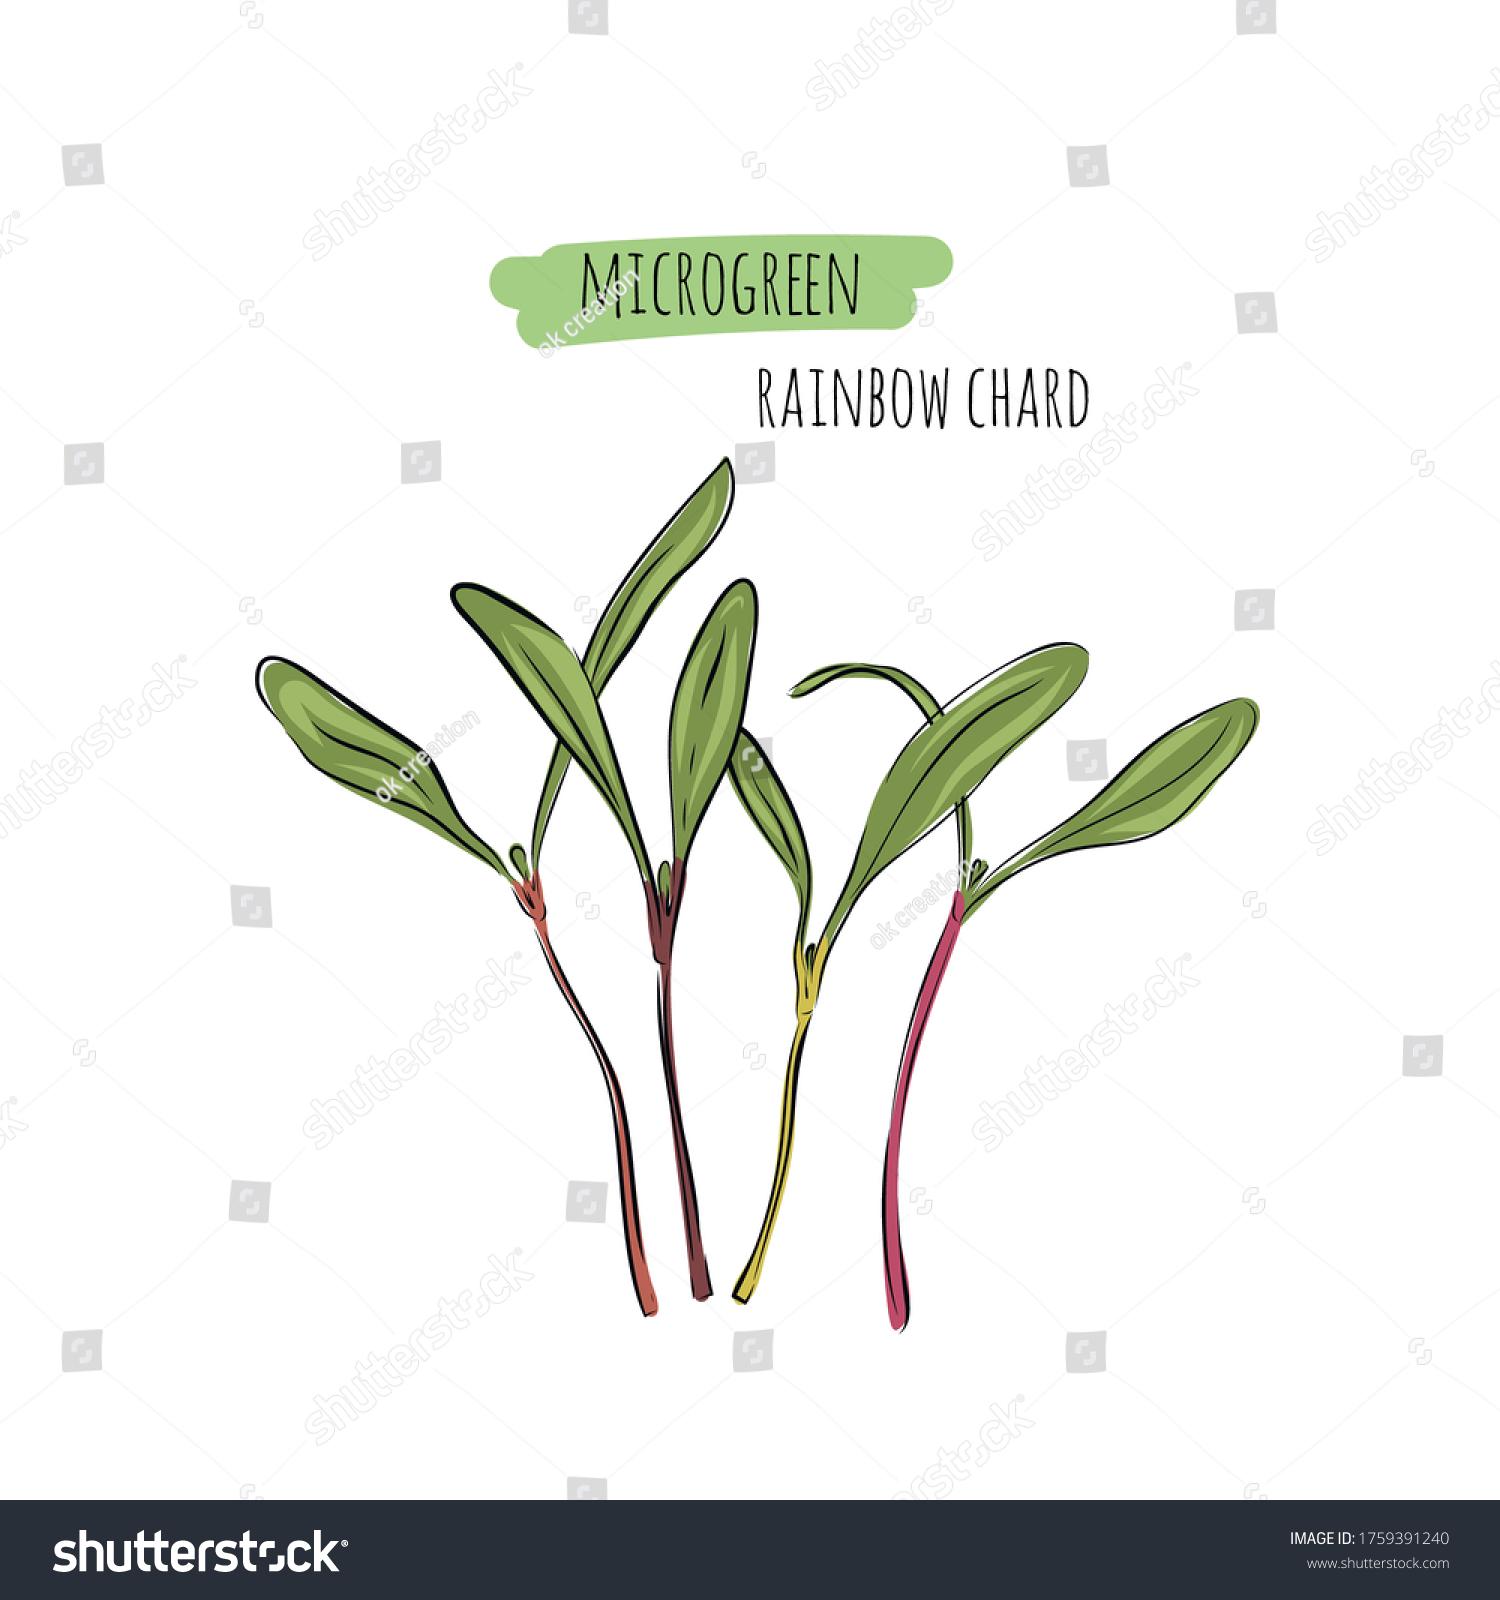 Hand Drawn Rainbow Chard Micro Greens Stock Vector Royalty Free 1759391240